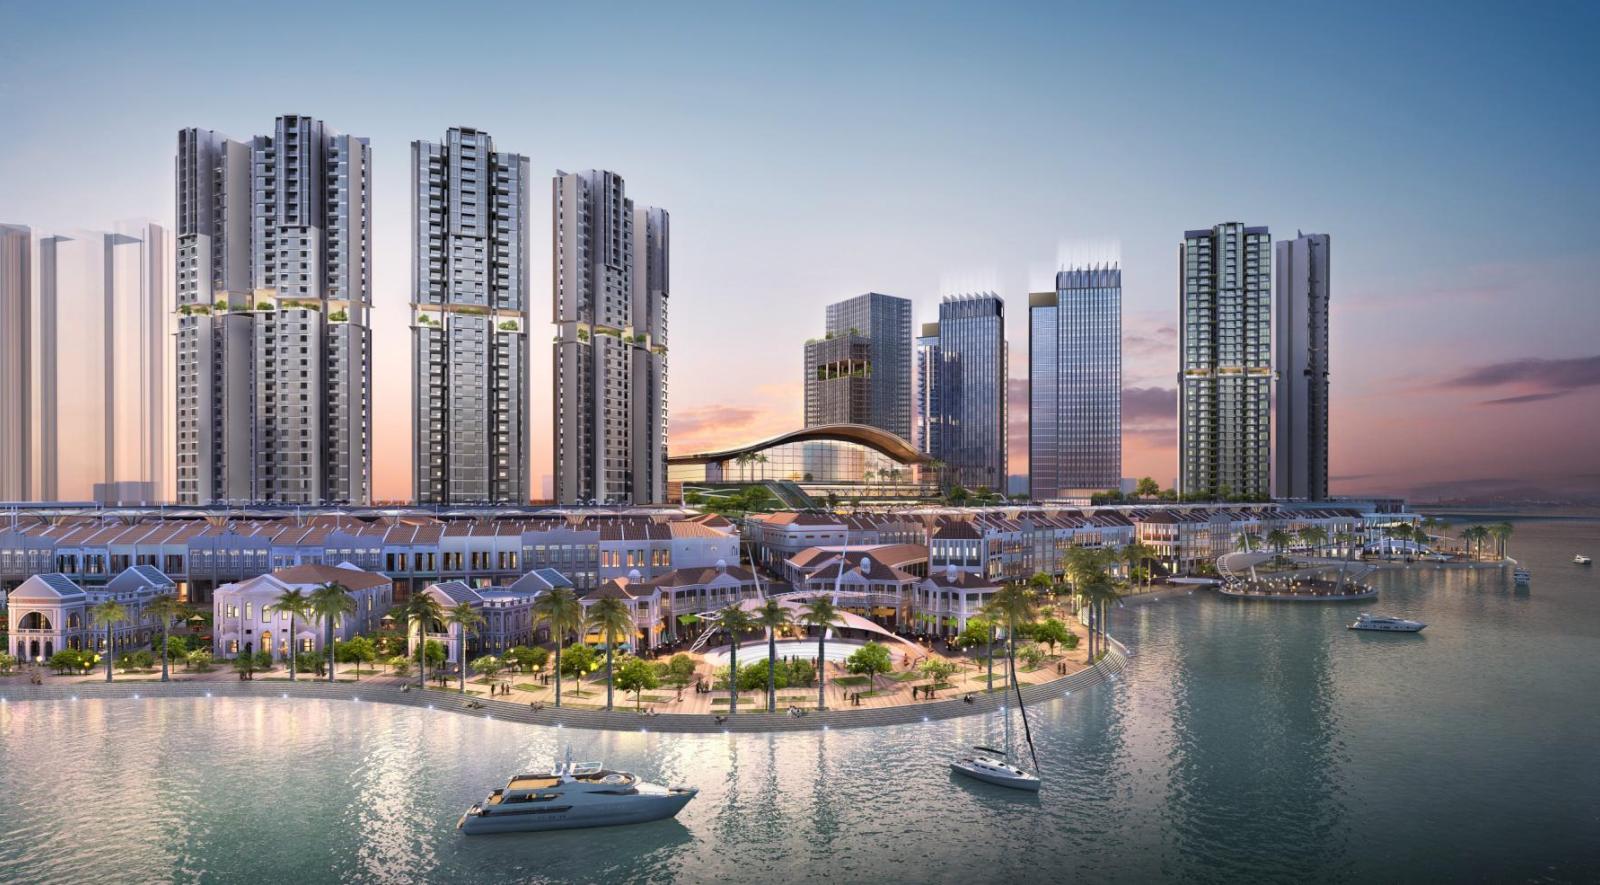 Waterfront in Penang